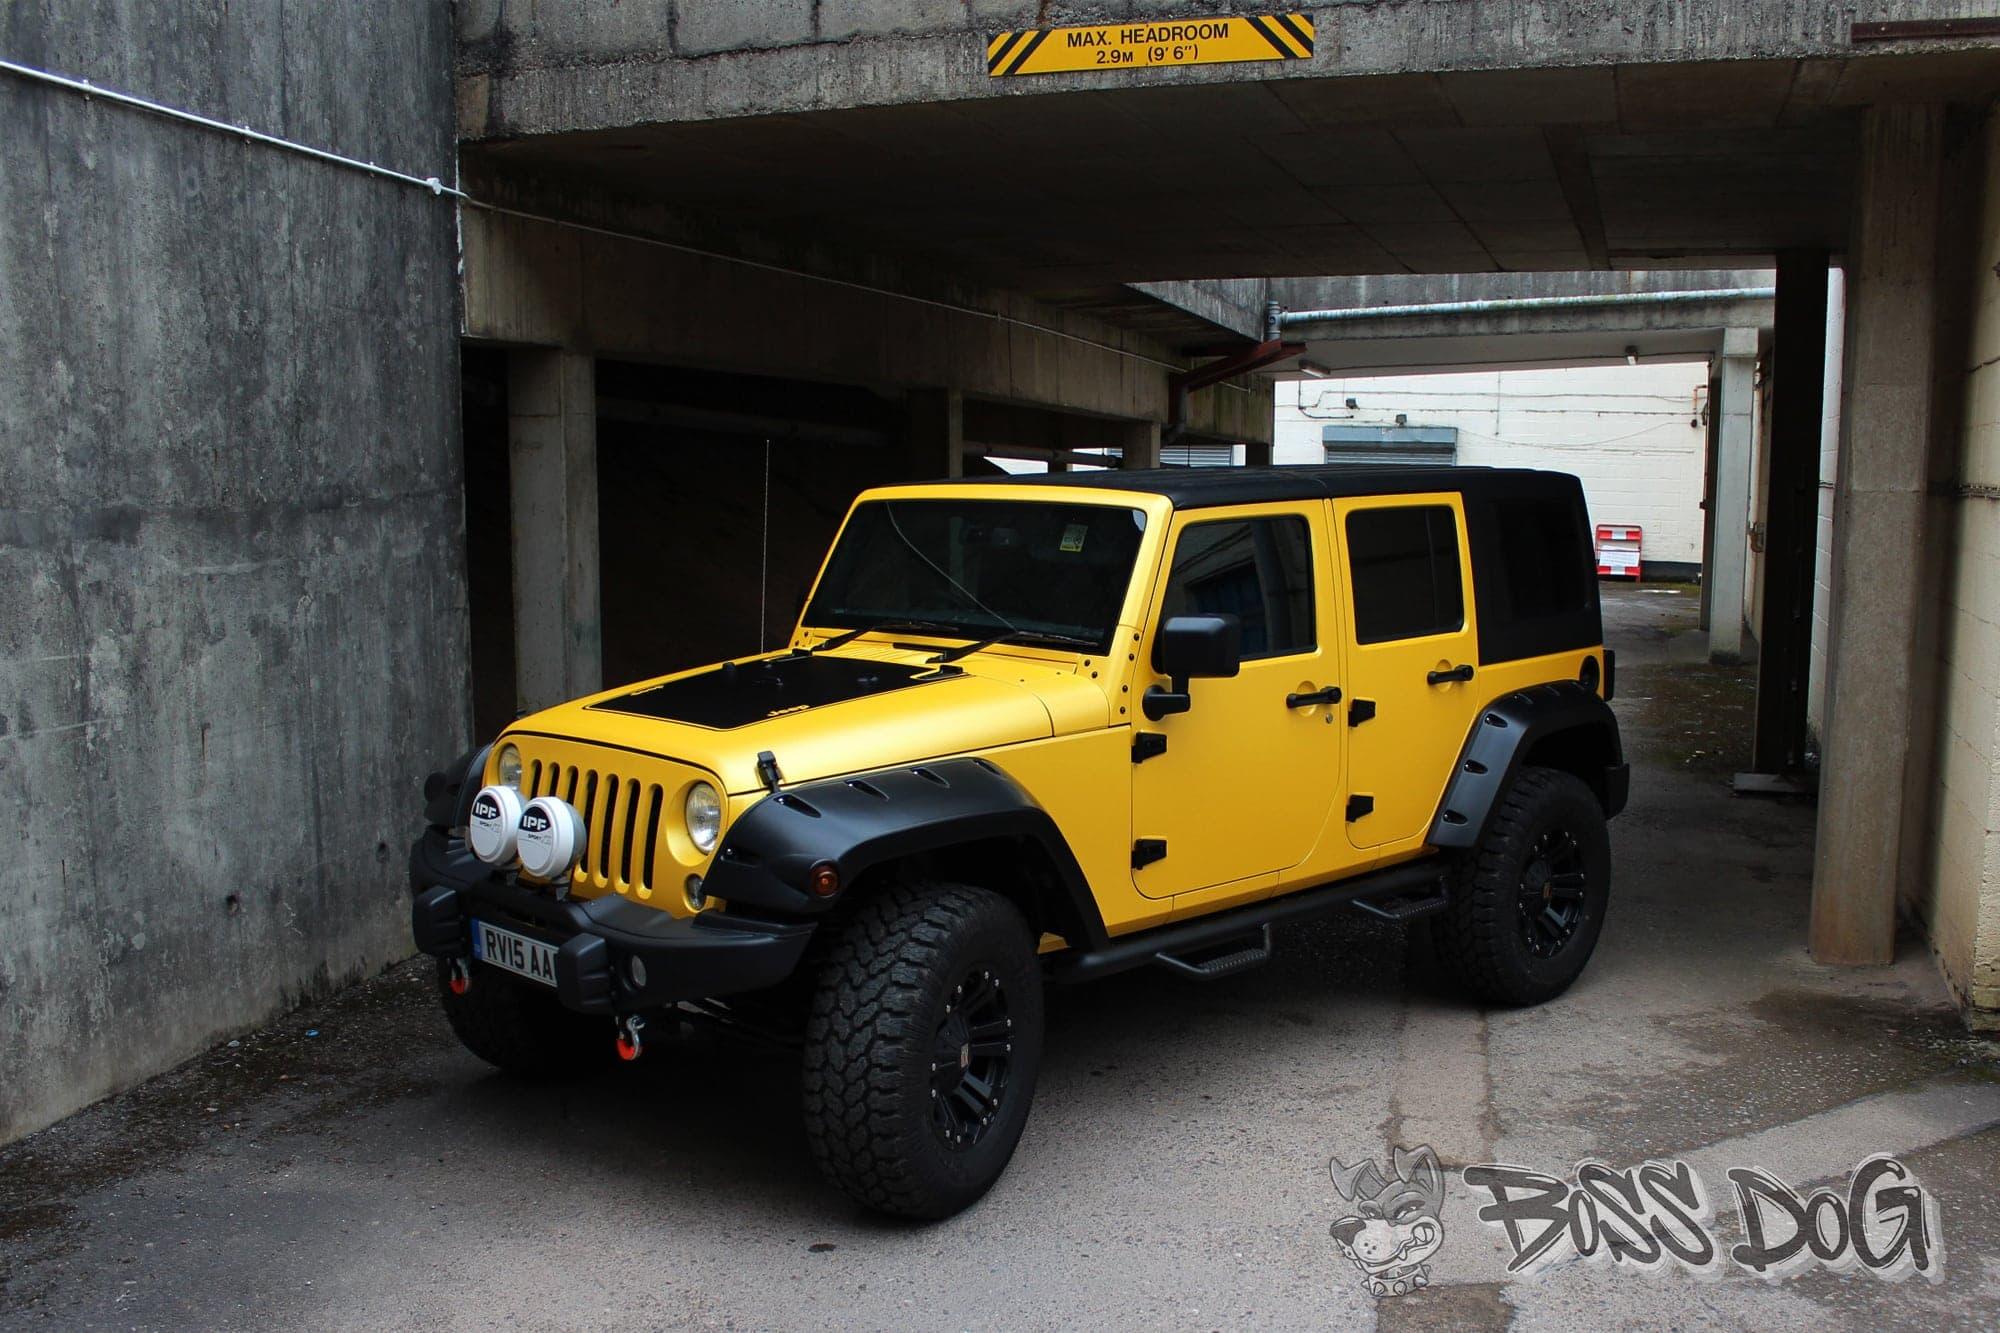 Jeep-Wrangler-Matt-sunflower - Boss Dog